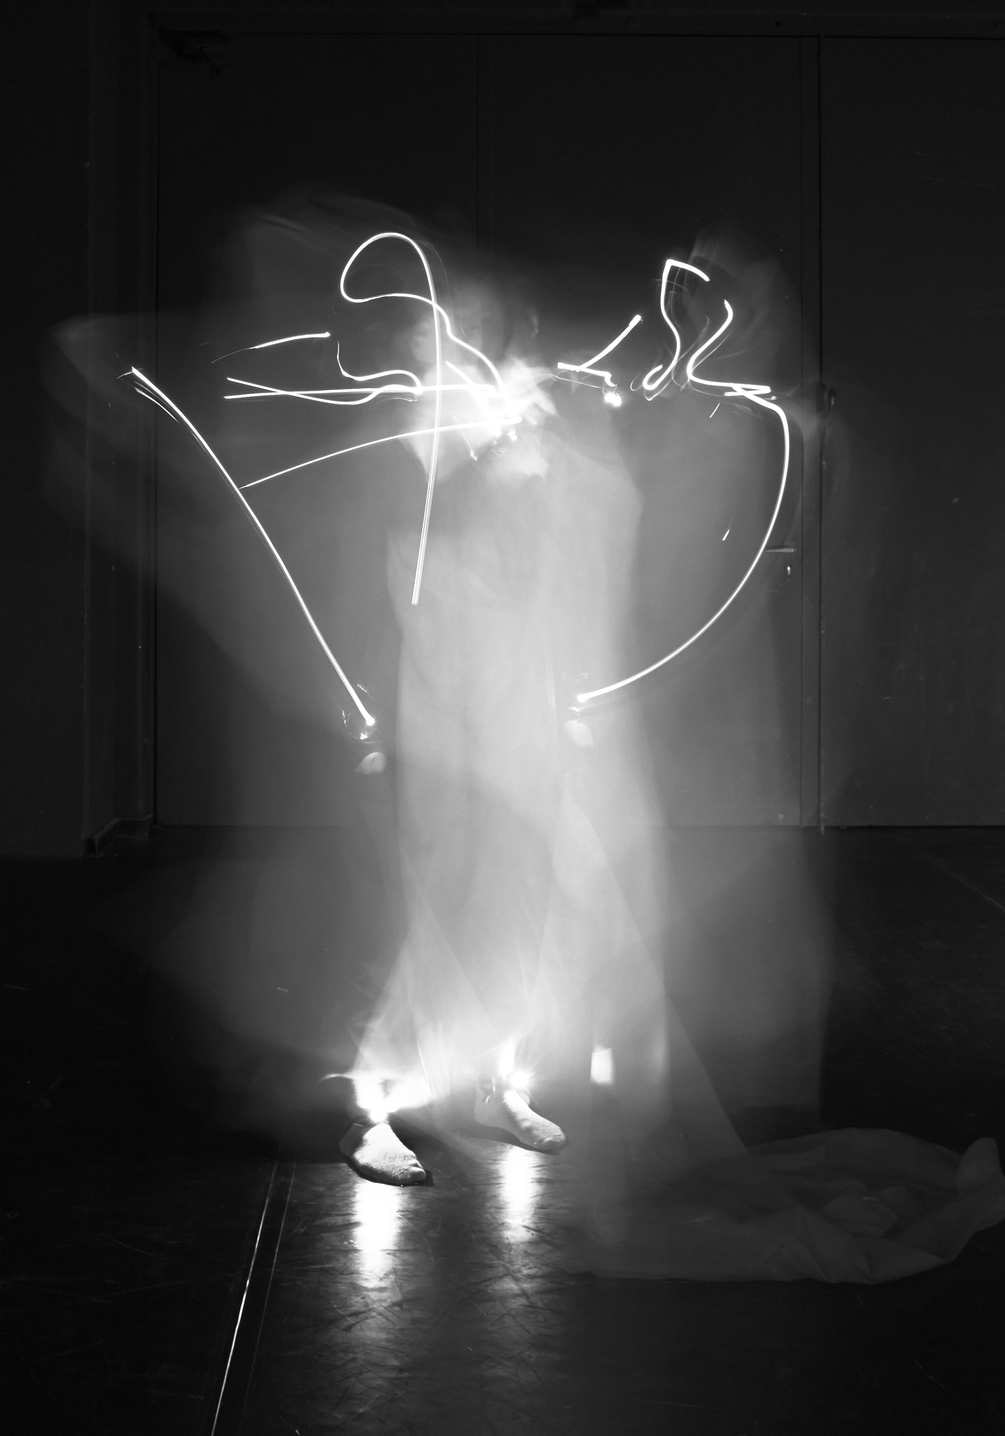 tracking-dance-folding-a-sheet-1005x1435px